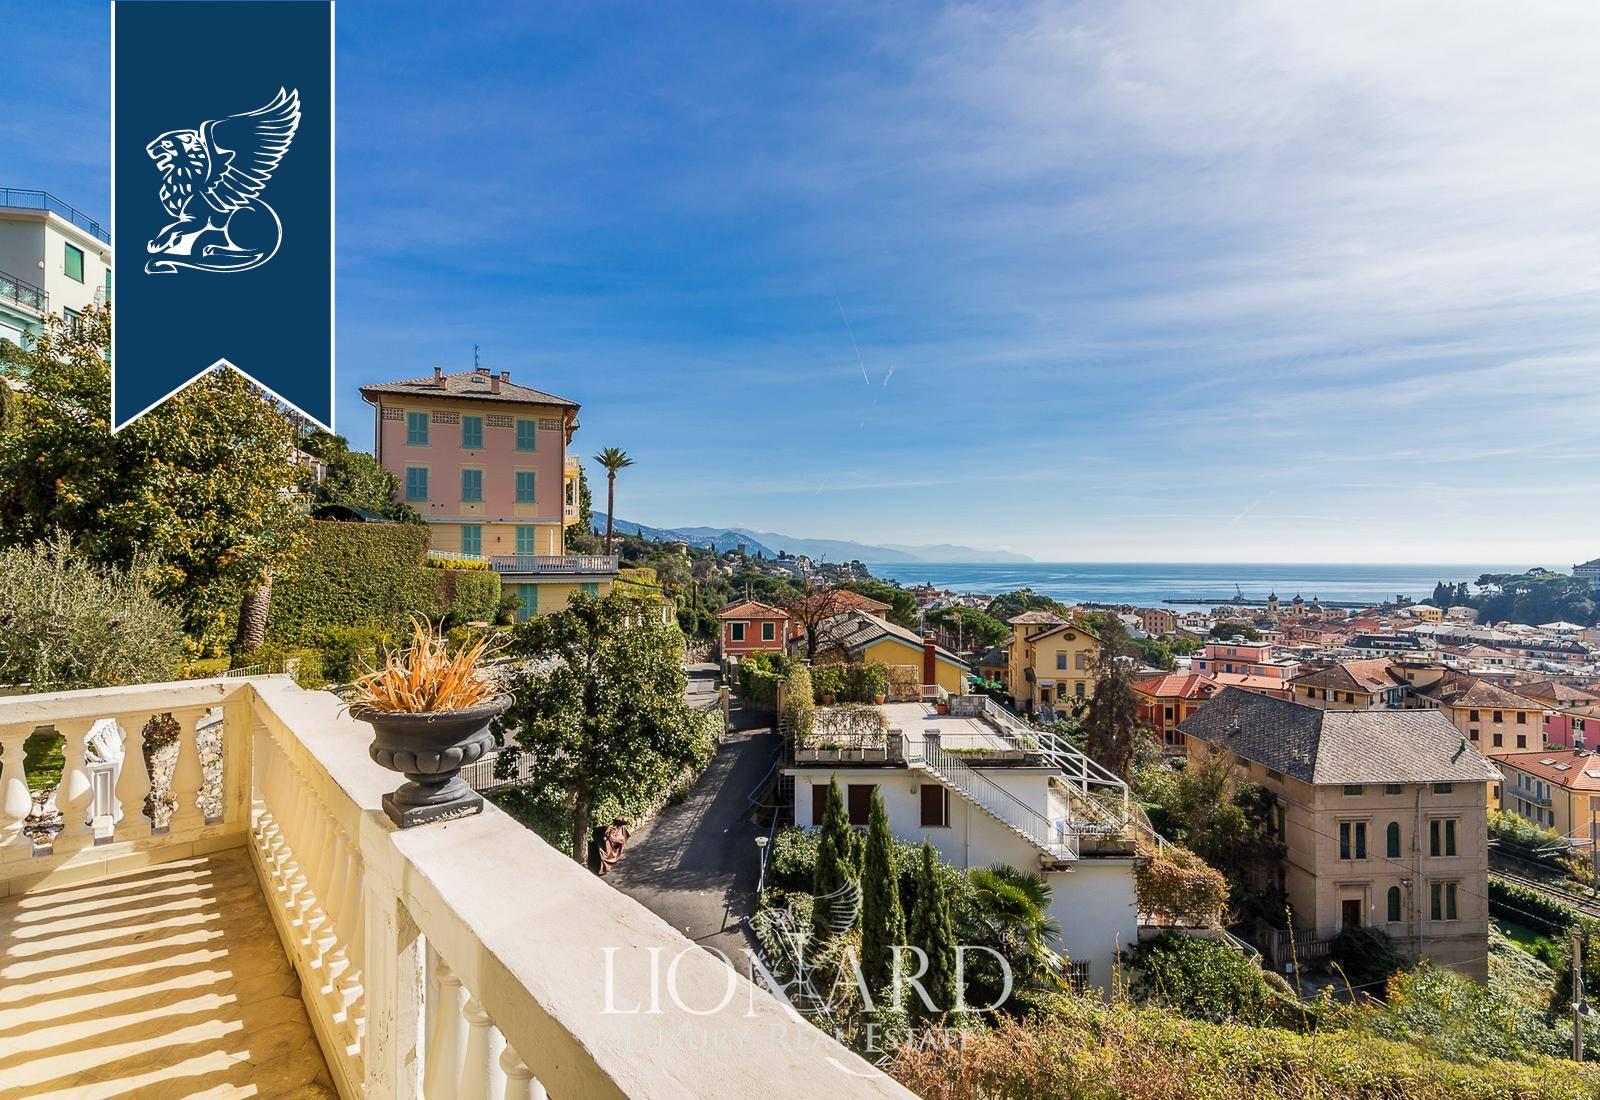 Villa in Vendita a Santa Margherita Ligure: 0 locali, 500 mq - Foto 5